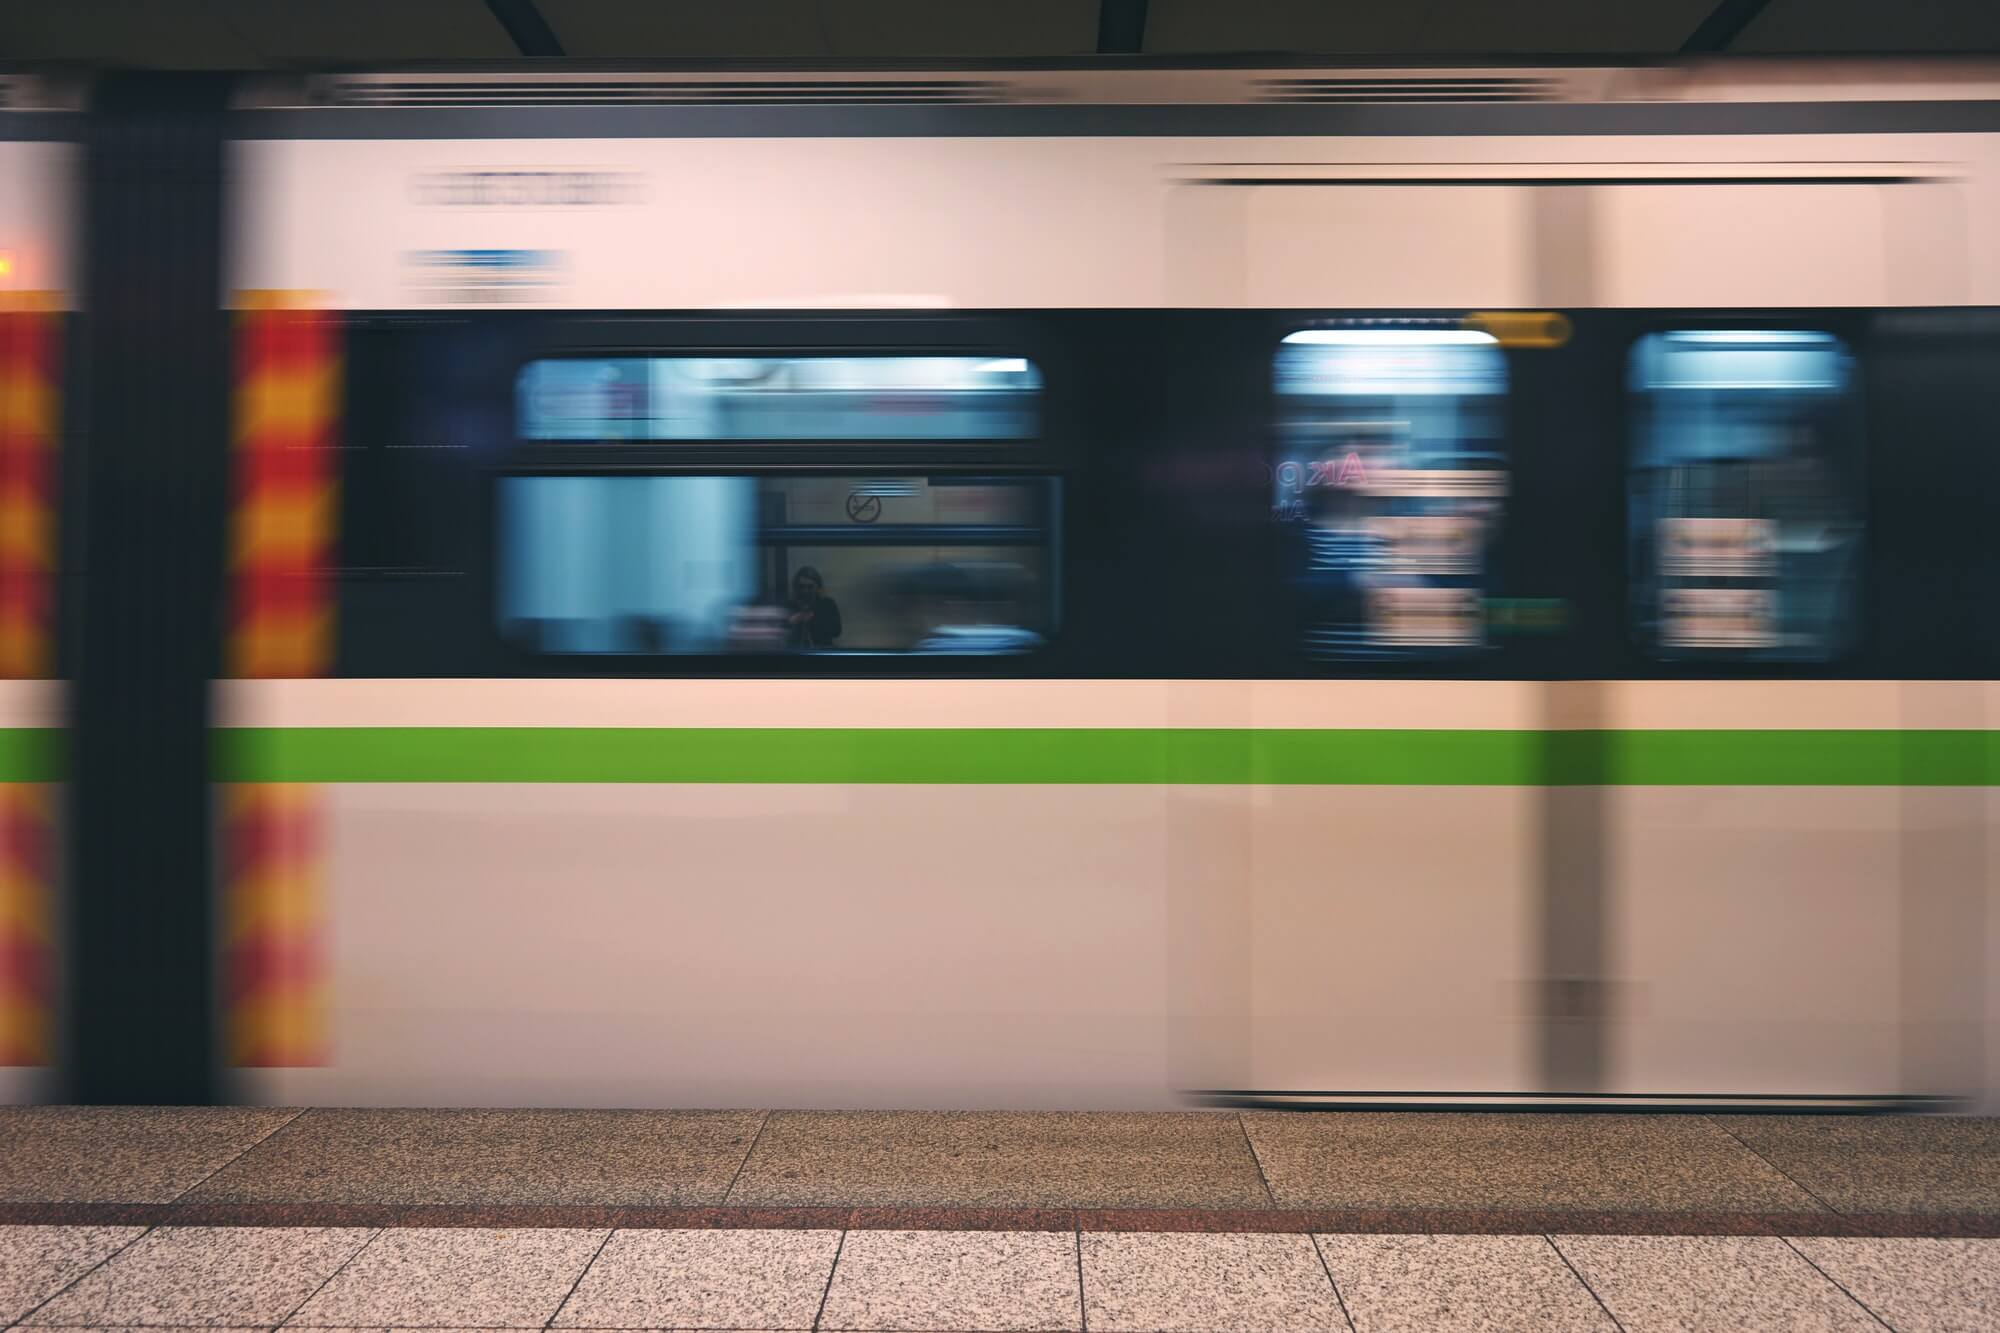 Metro train speeding up in the subway